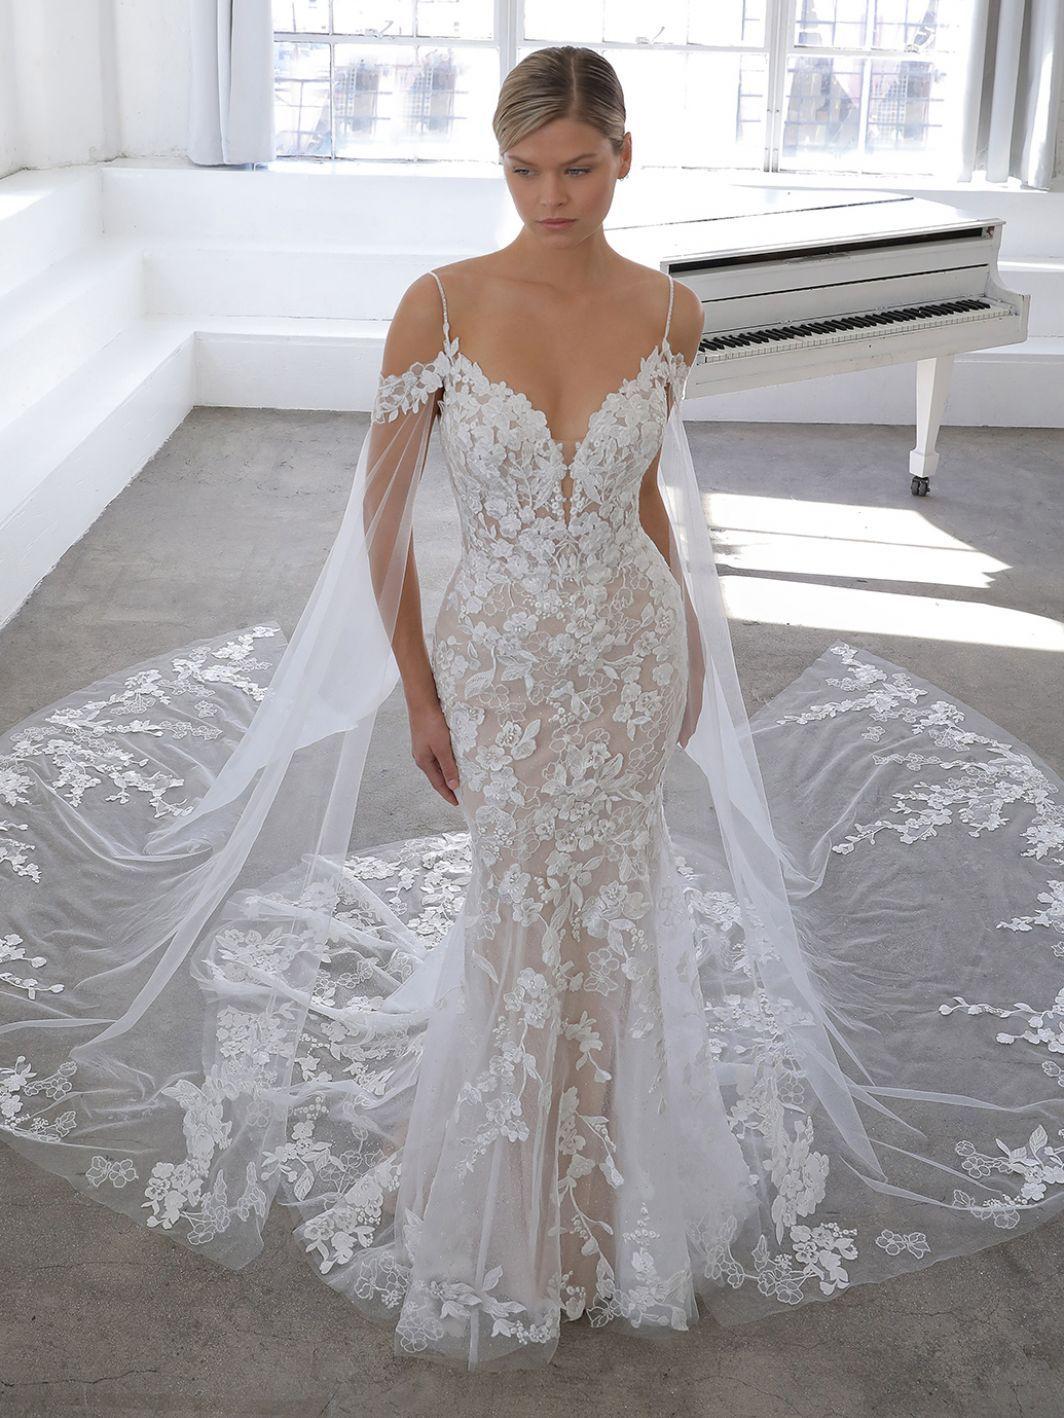 Nadia 2021 Blue By Enzoani Enzoani Enzoani Wedding Dresses Glitter Bridesmaid Dresses Wedding Dresses [ 1418 x 1064 Pixel ]